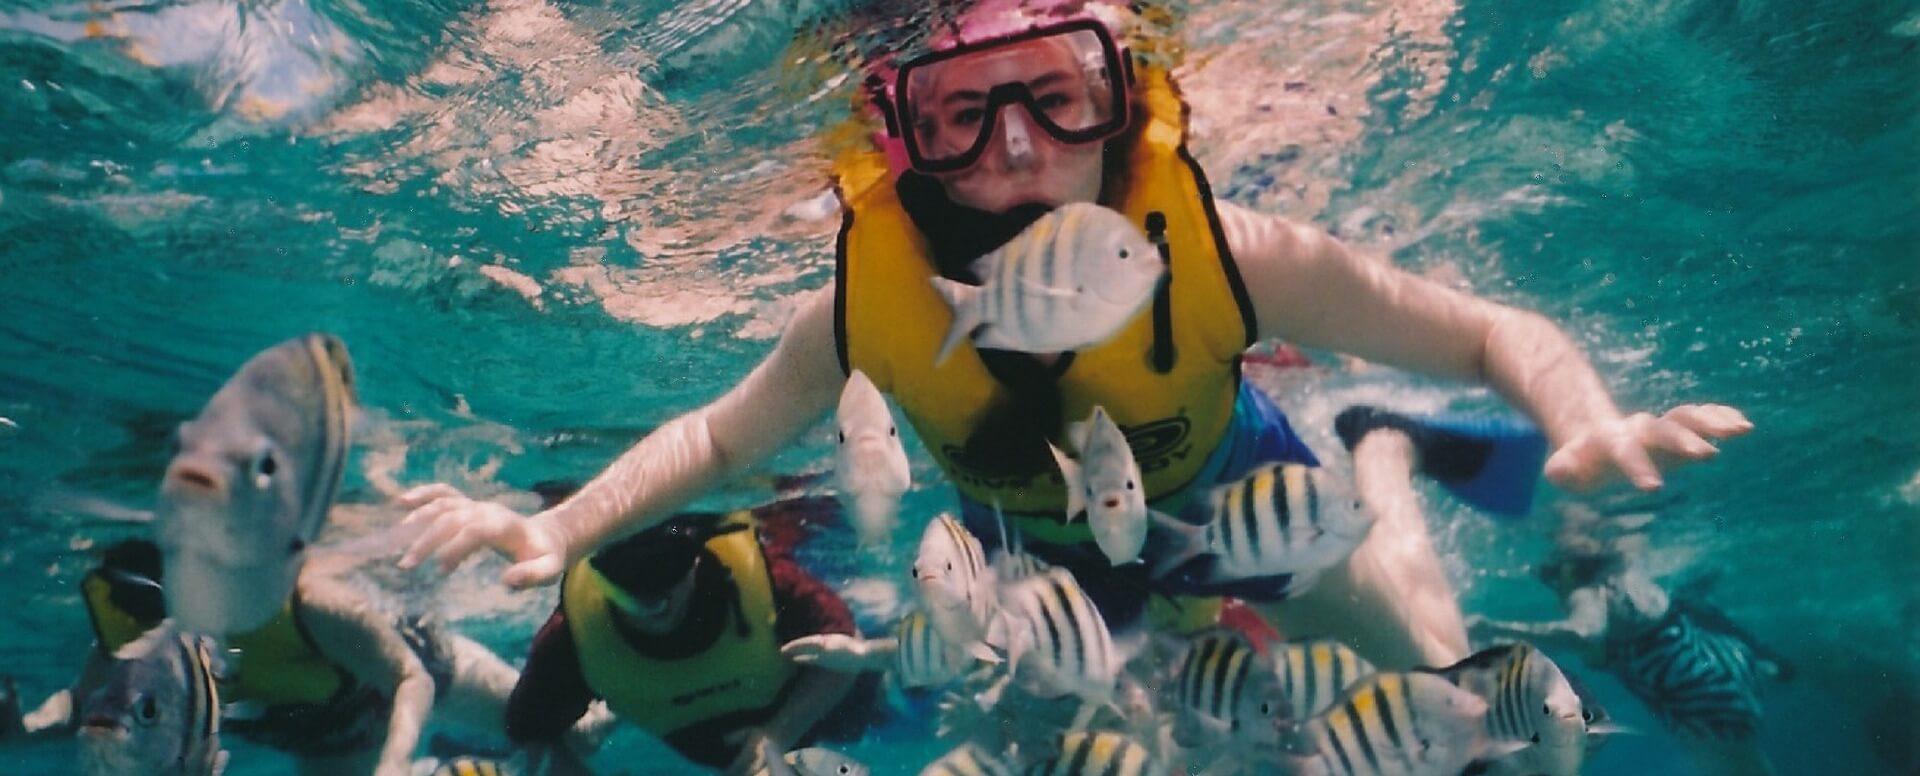 Faire du snorkeling à Akumal, Quintana Roo - Mexique